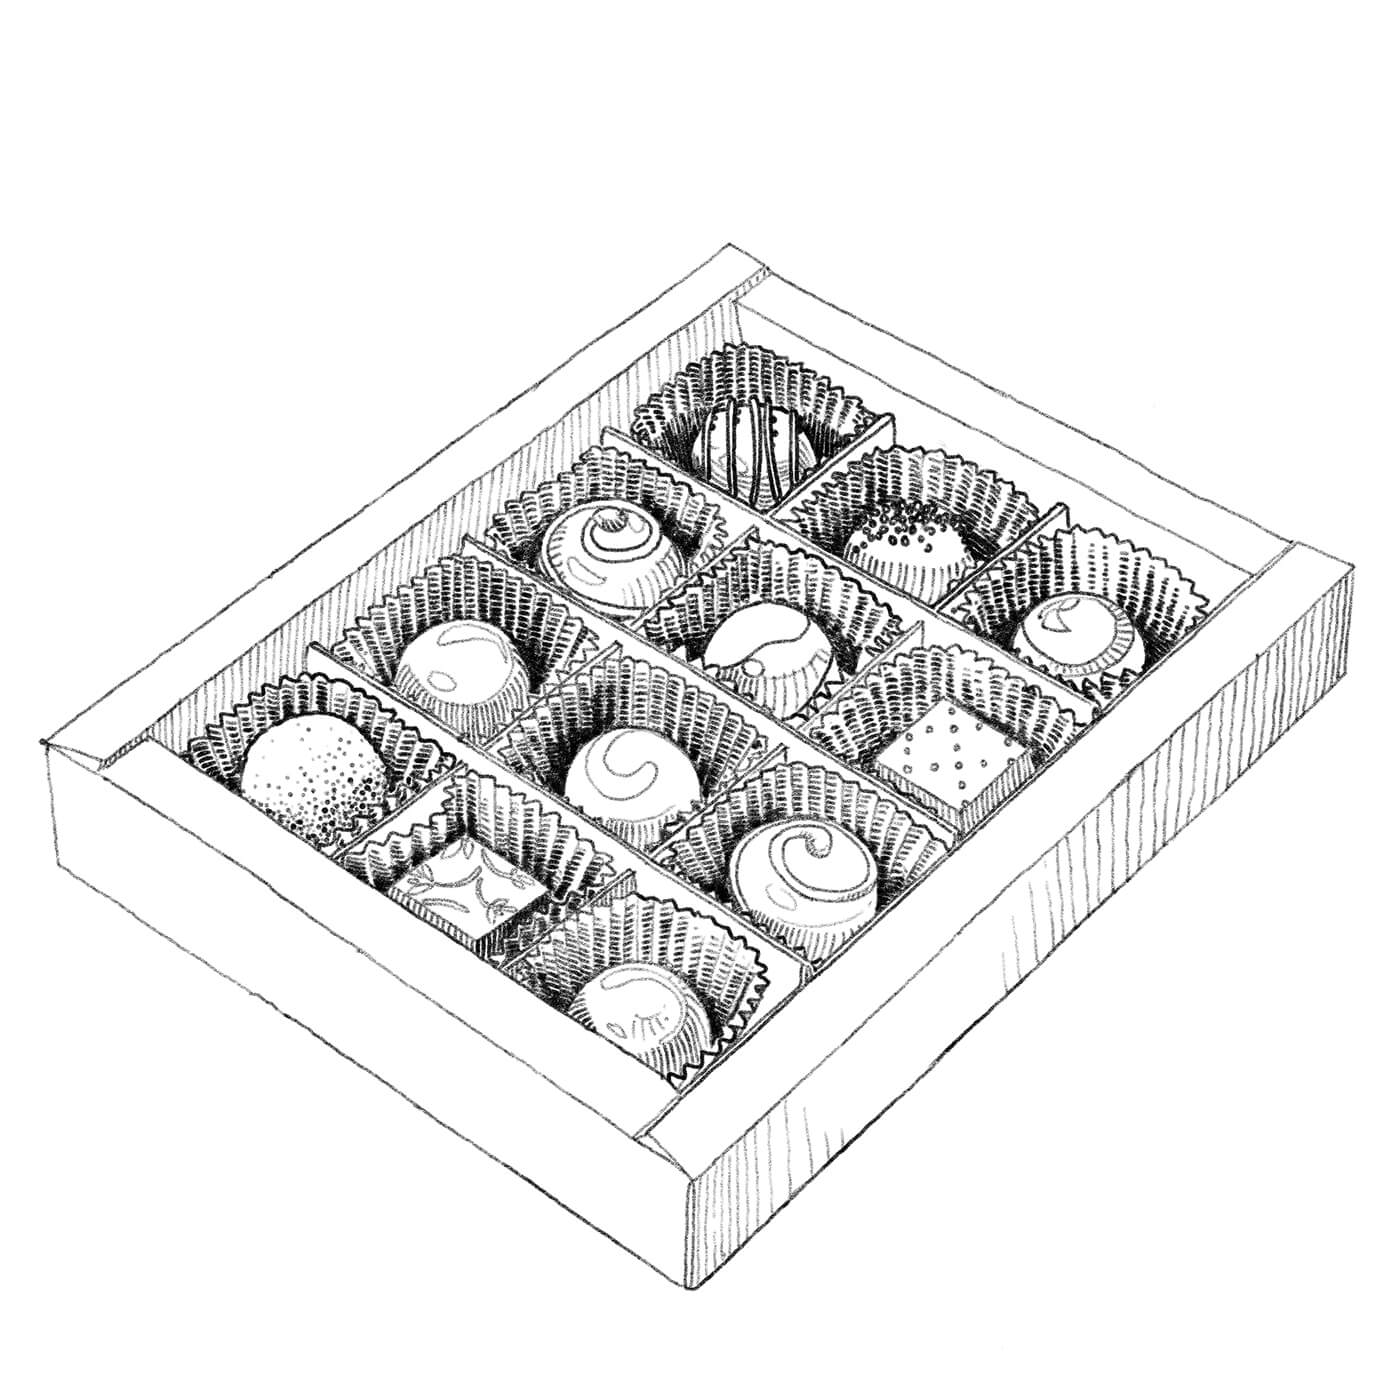 Illustrated box of chocolates